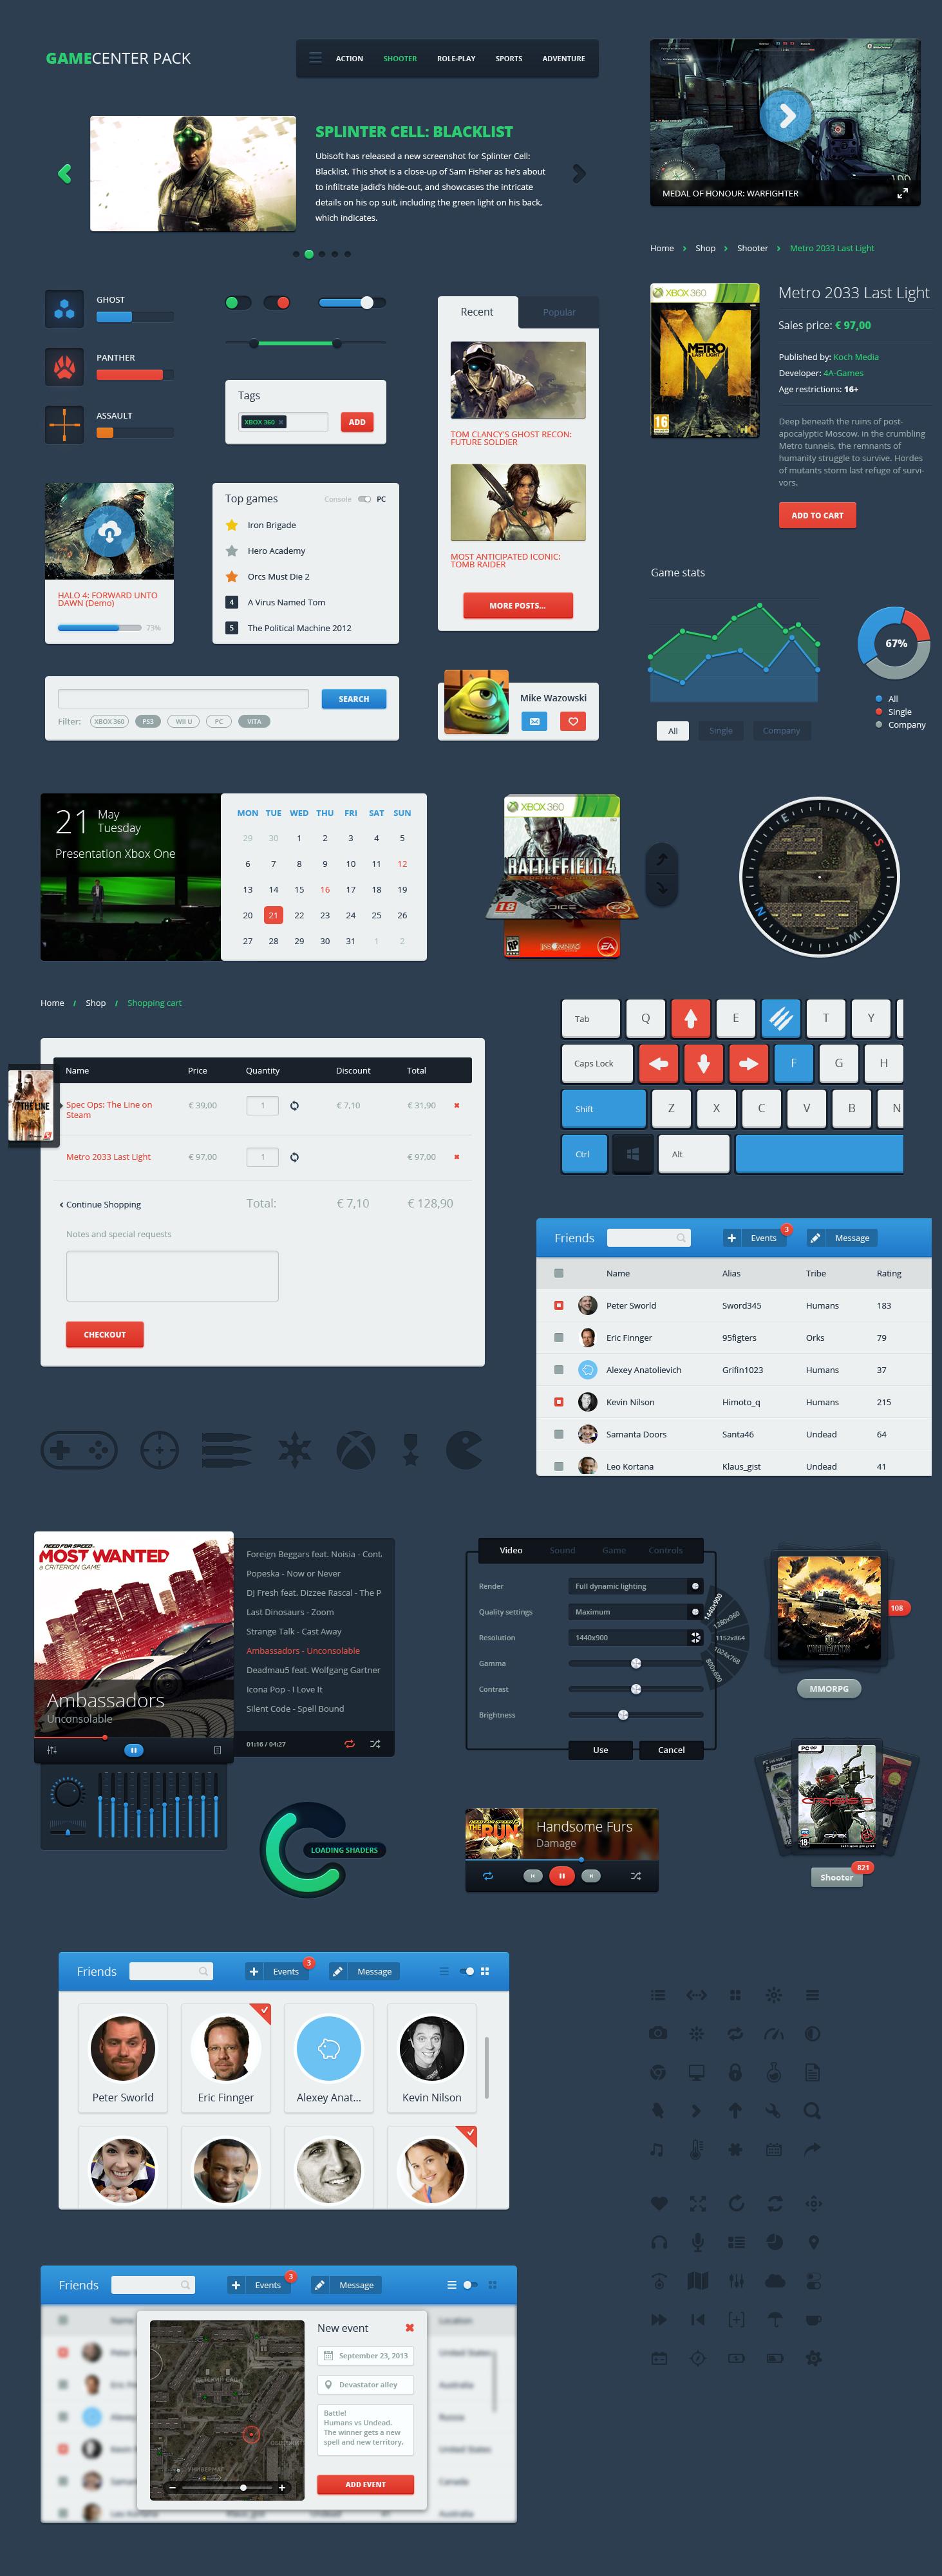 Gamecenter Complete UI Elements Kit PSD